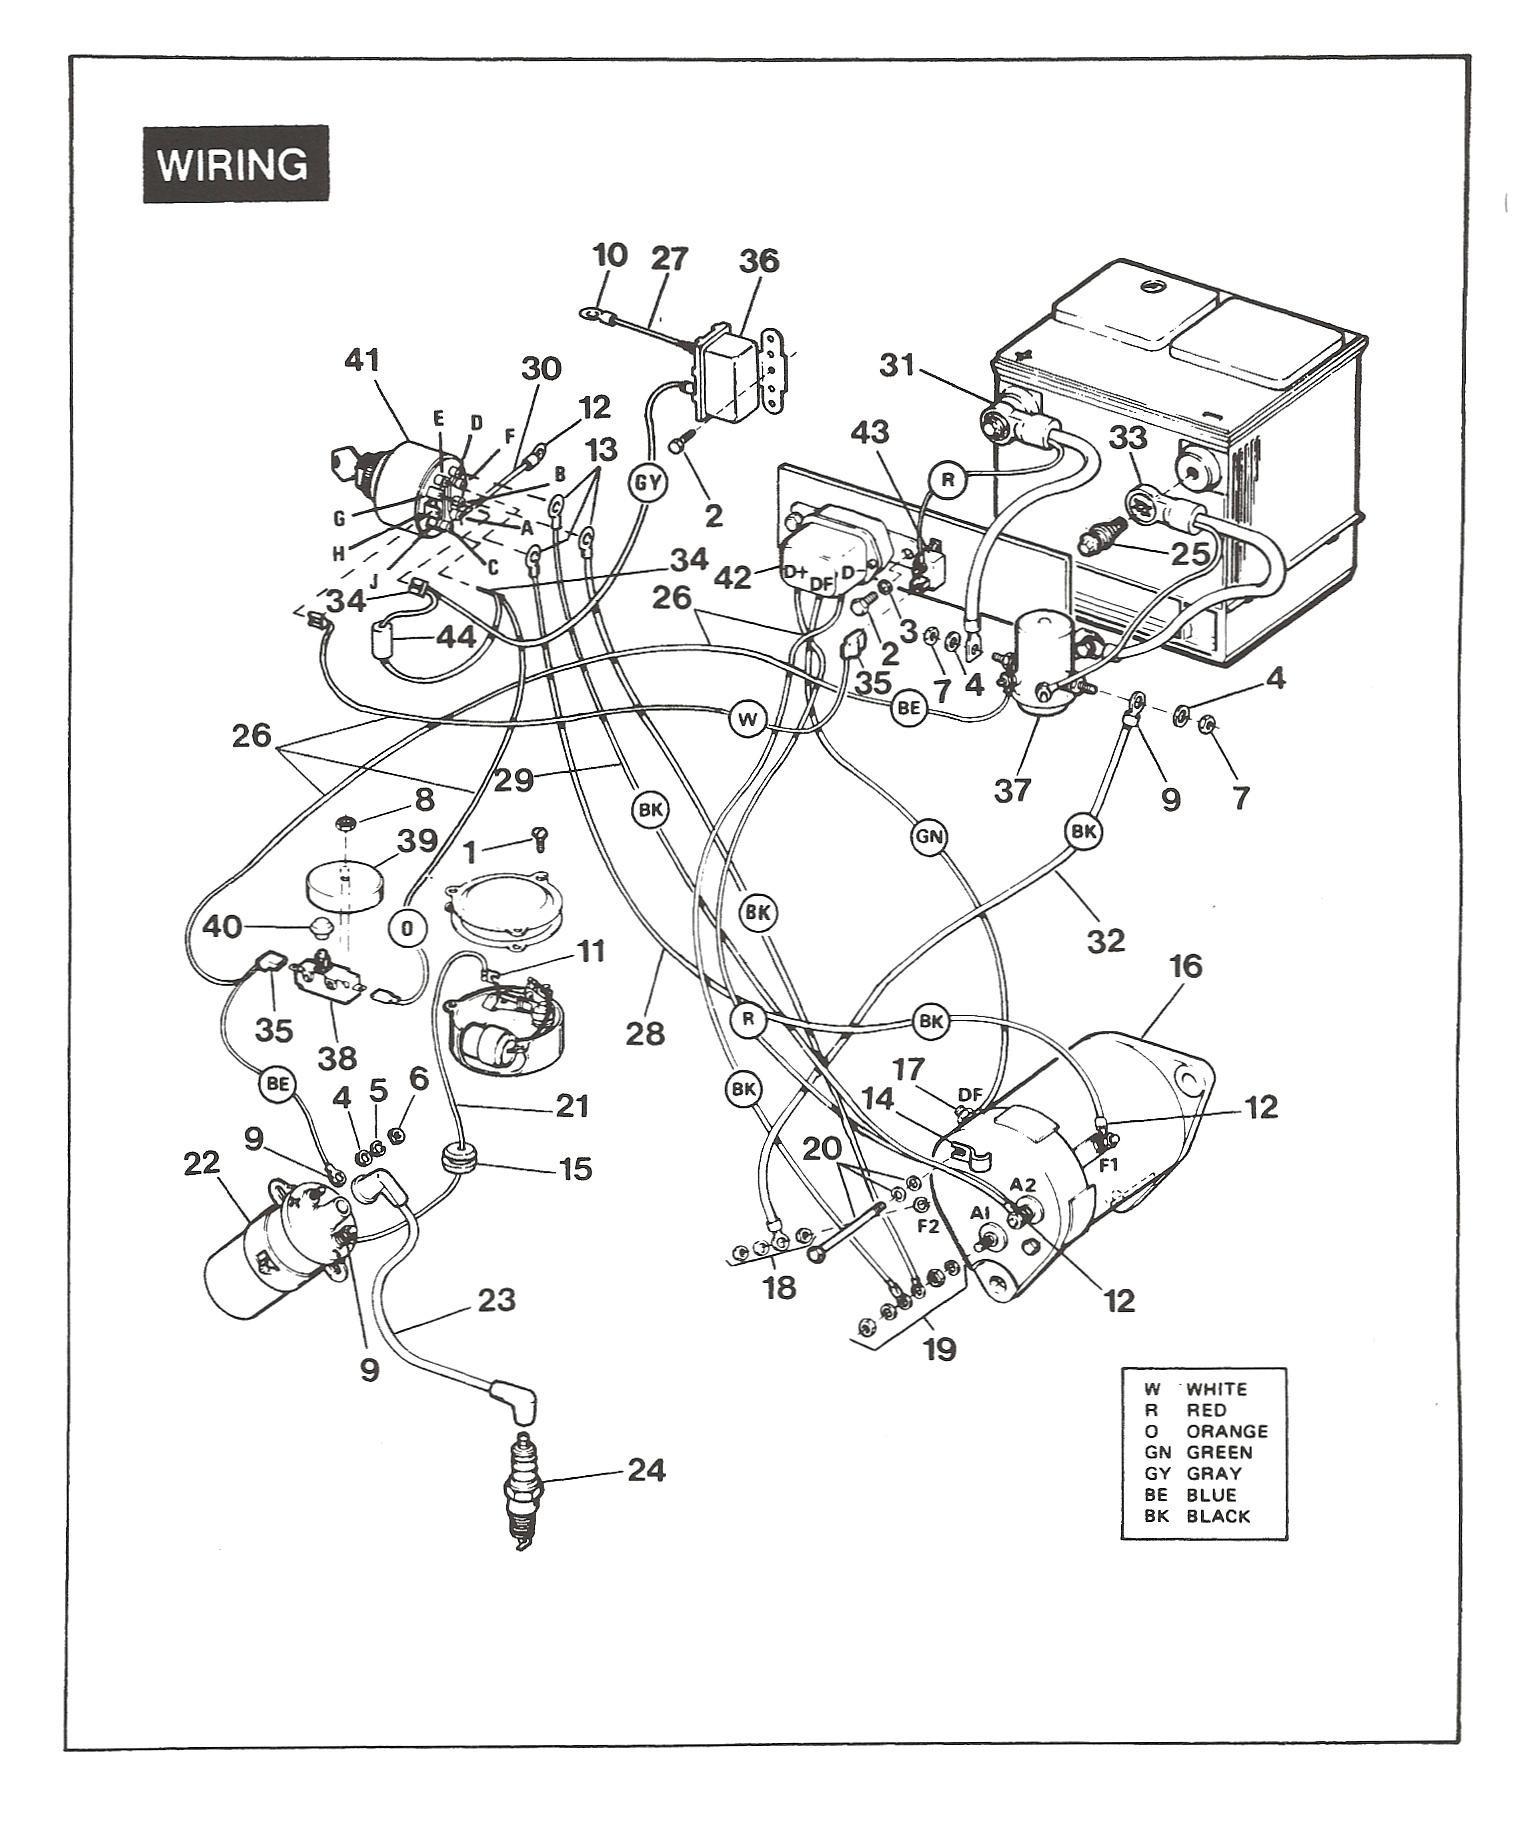 [44+] Ezgo Golf Cart Battery Wiring Diagram